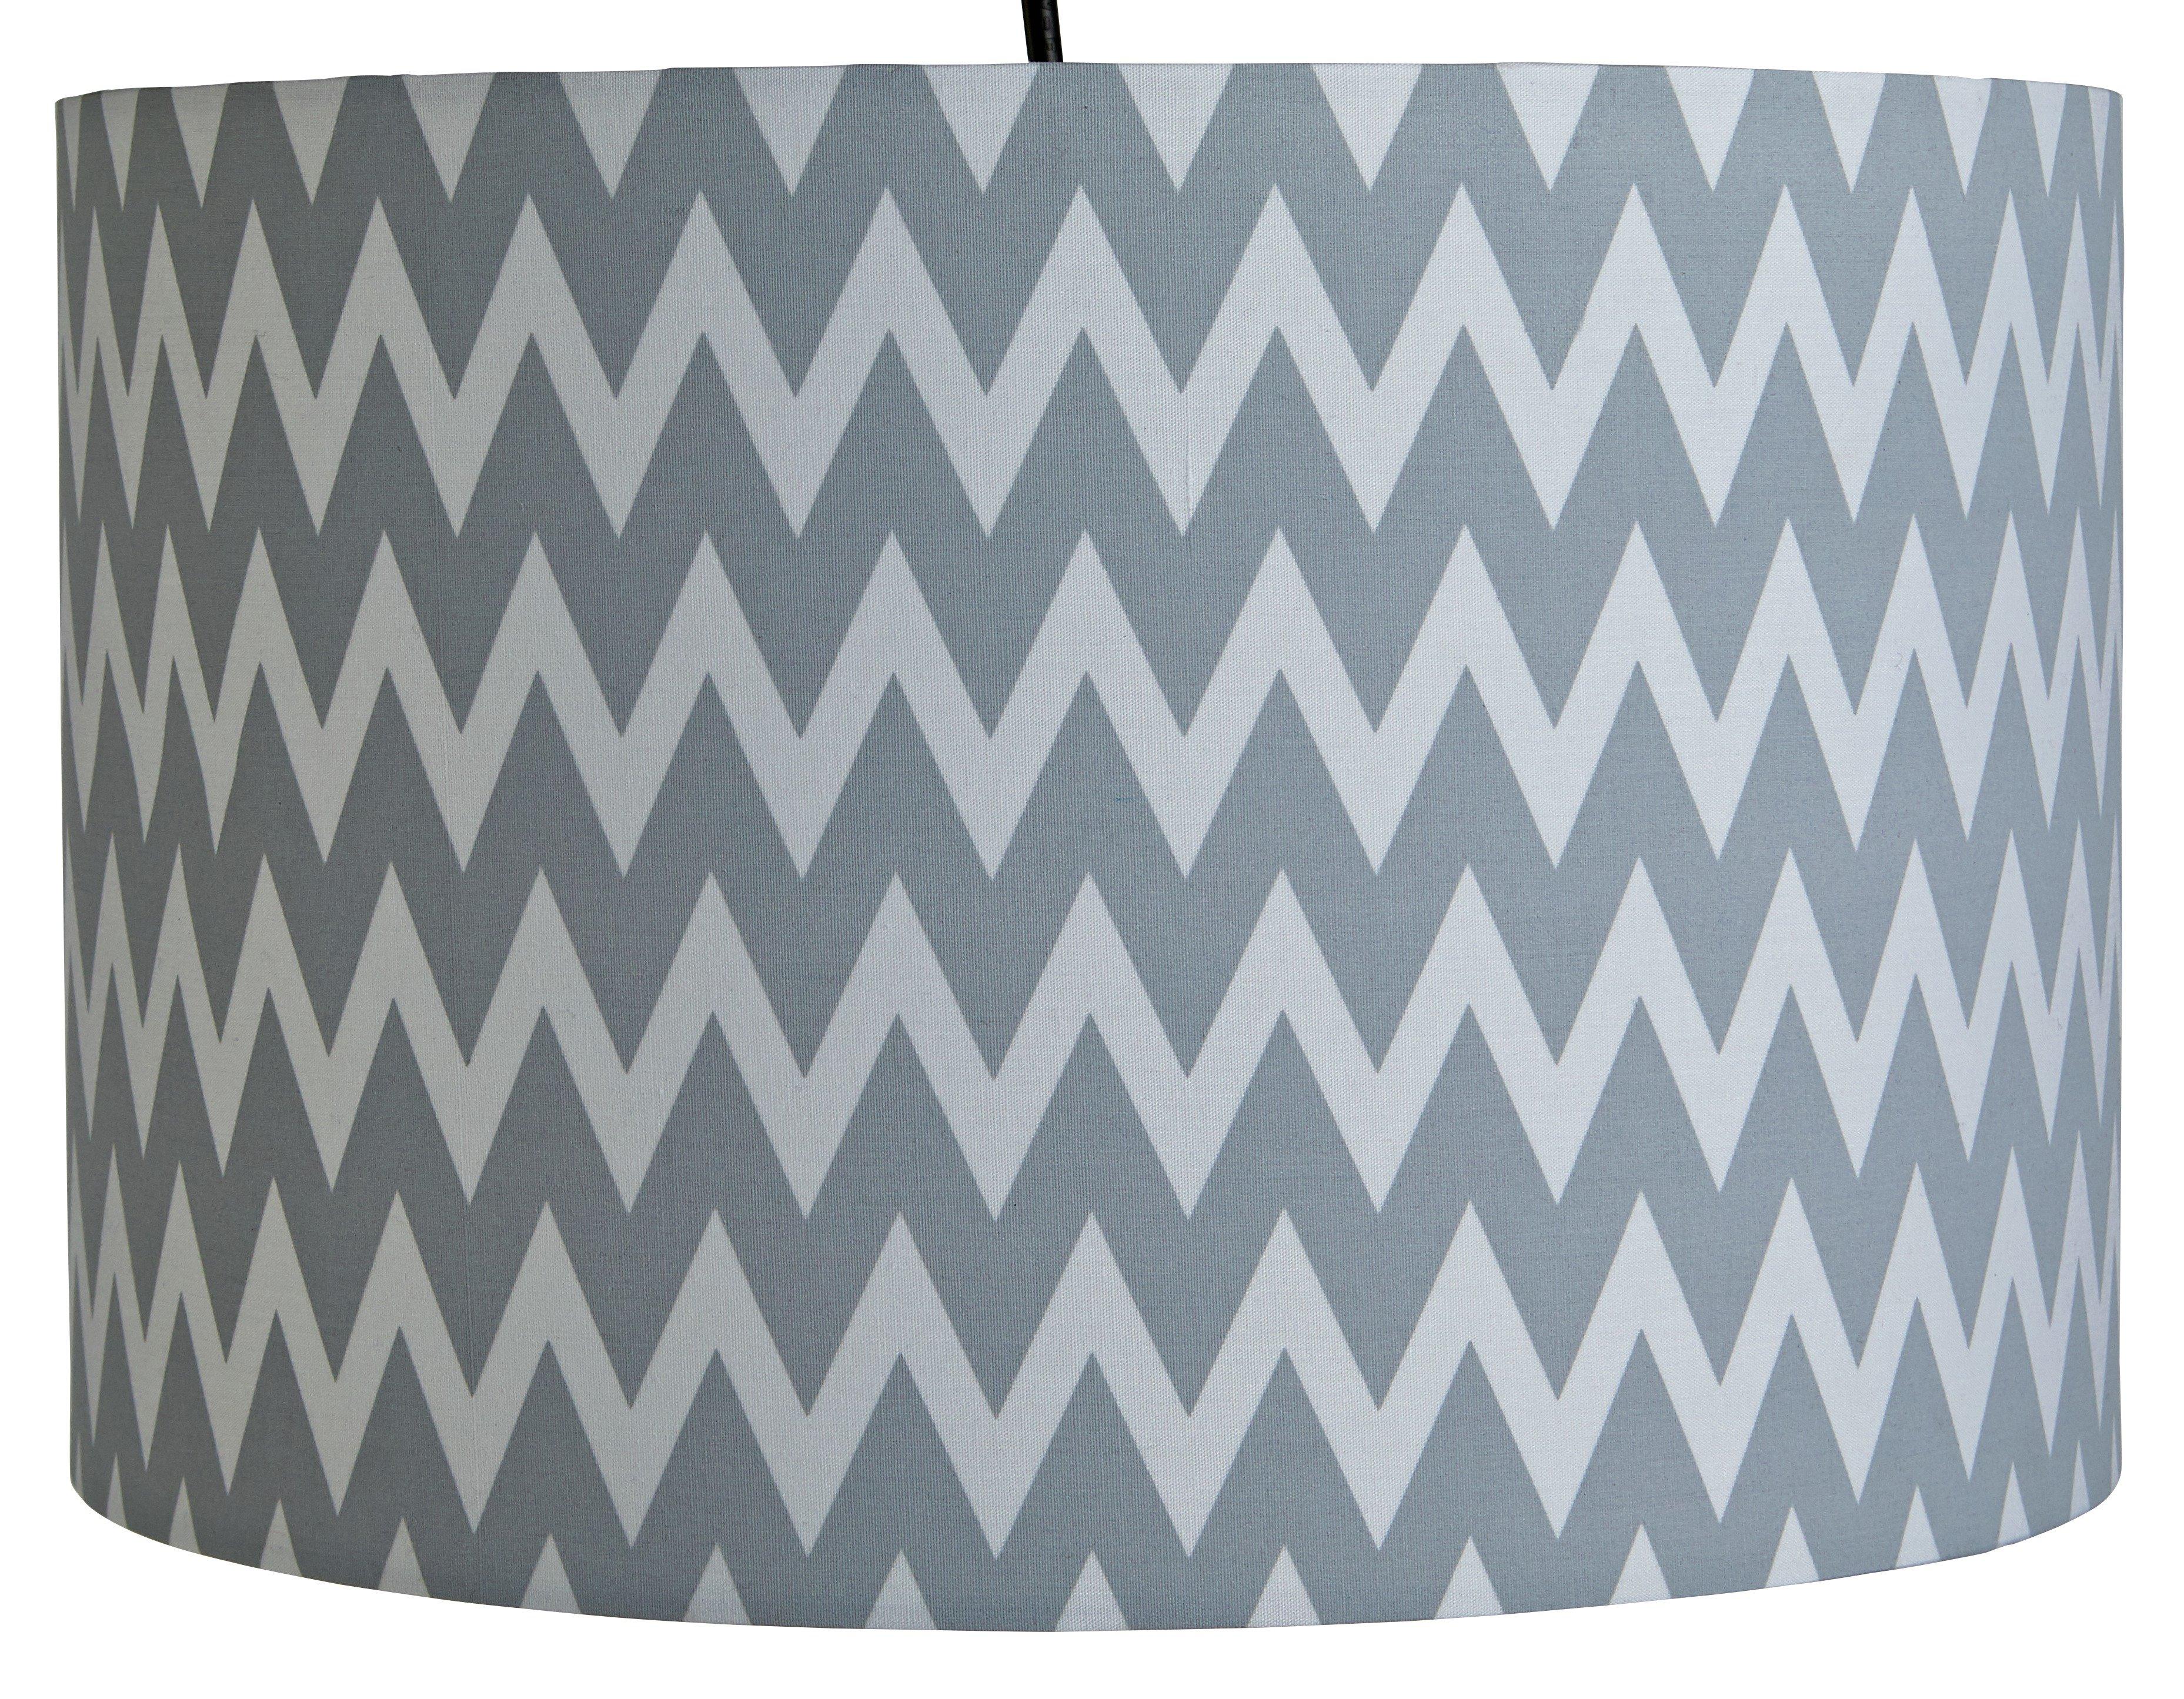 Argos Home Wave Pendant  Light Shade - Grey & White